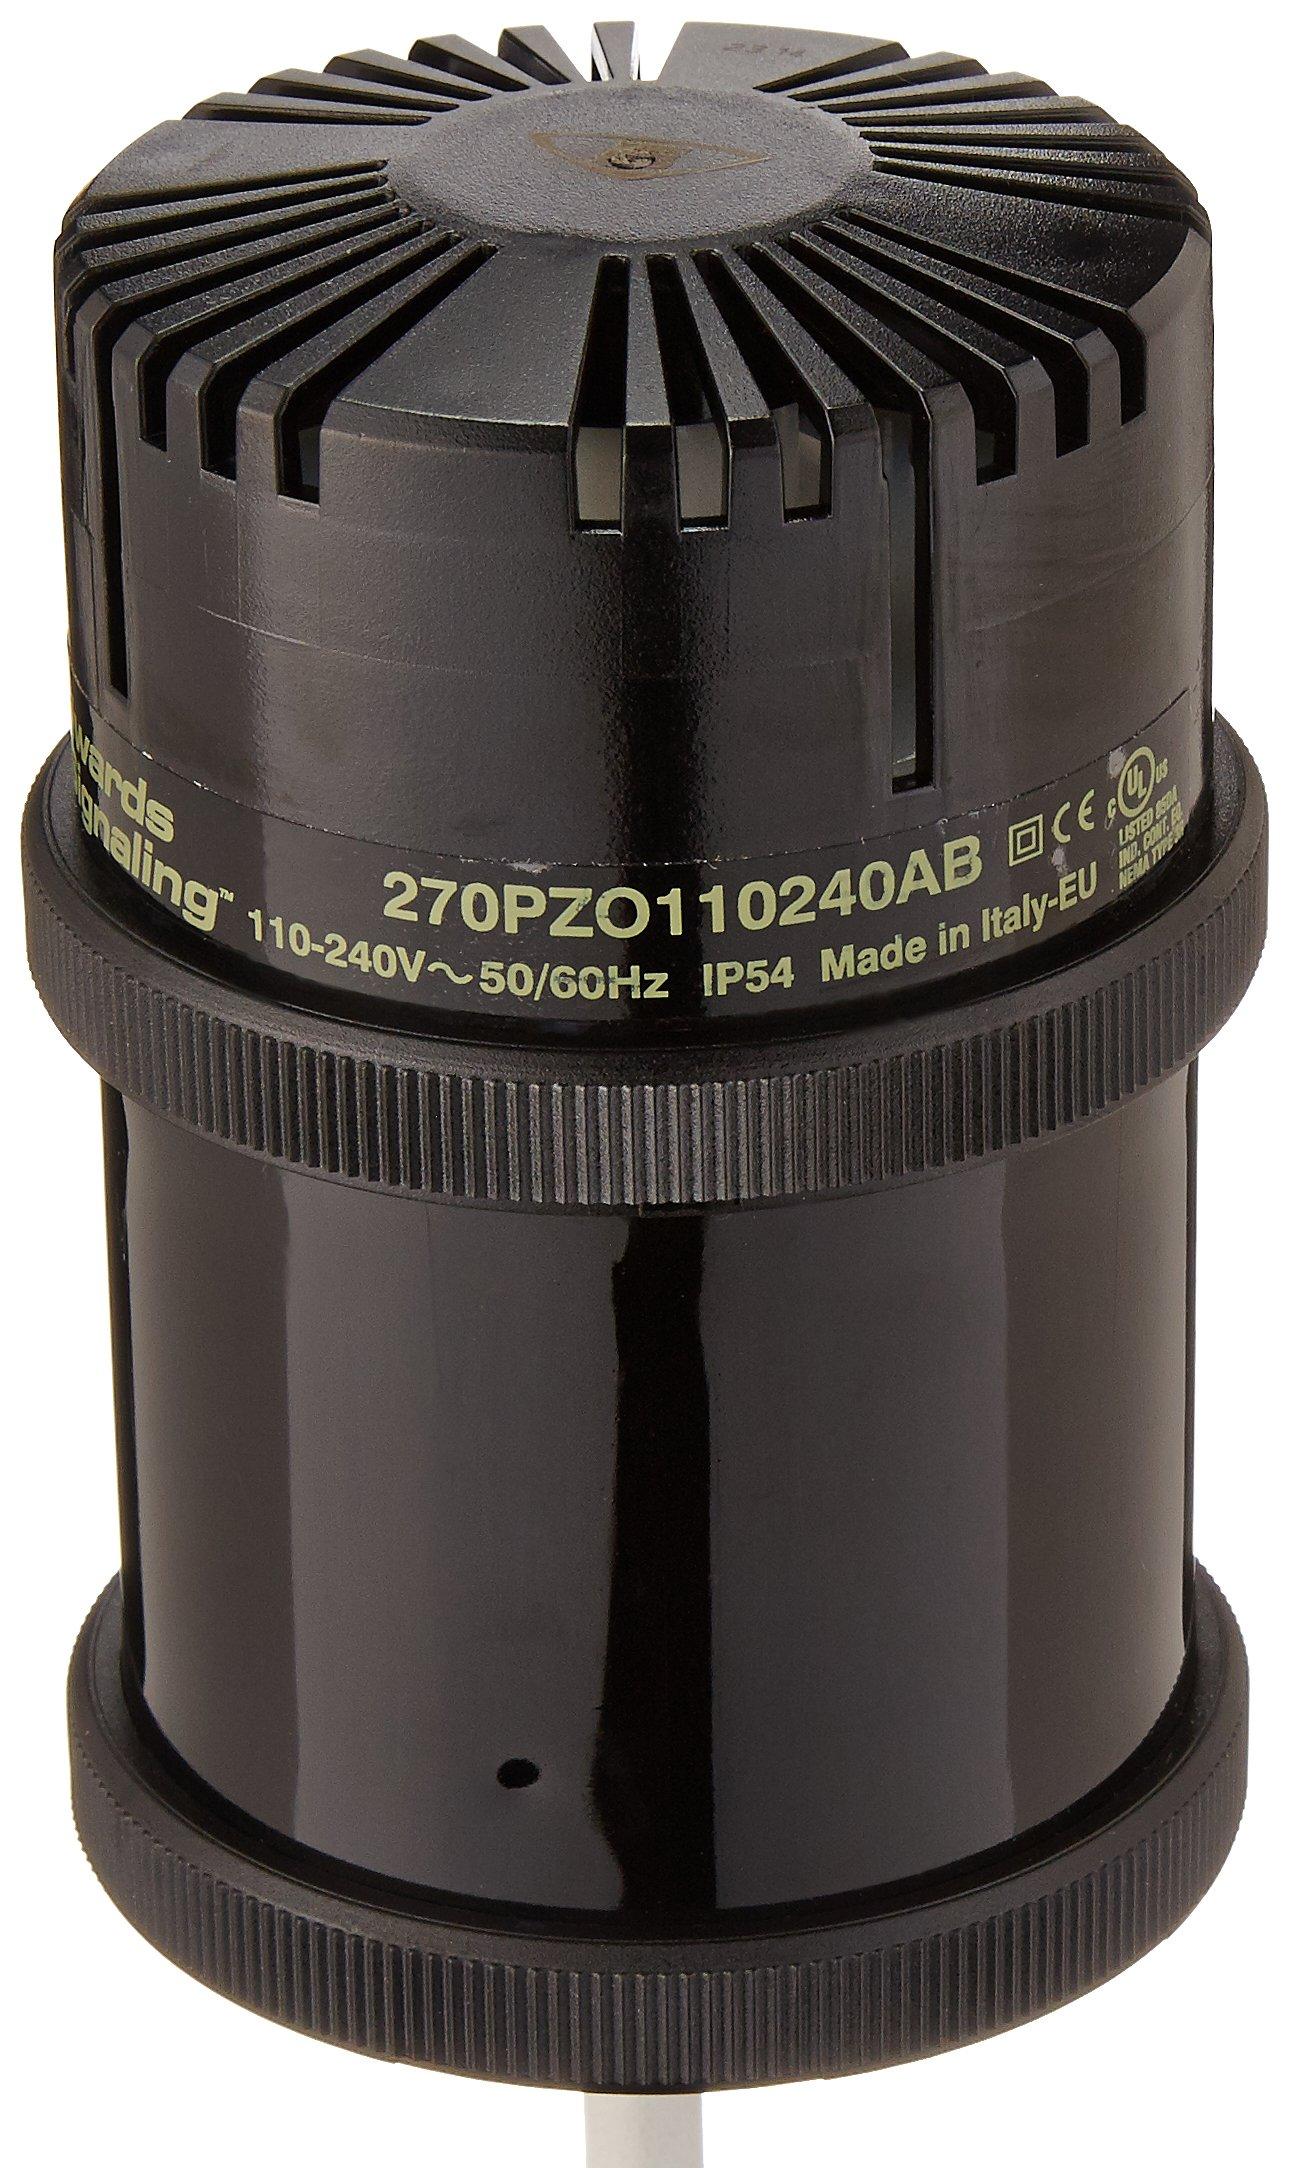 Edwards Signaling 270PZO120240AB Piezoelectric Sounder Module, 70mm